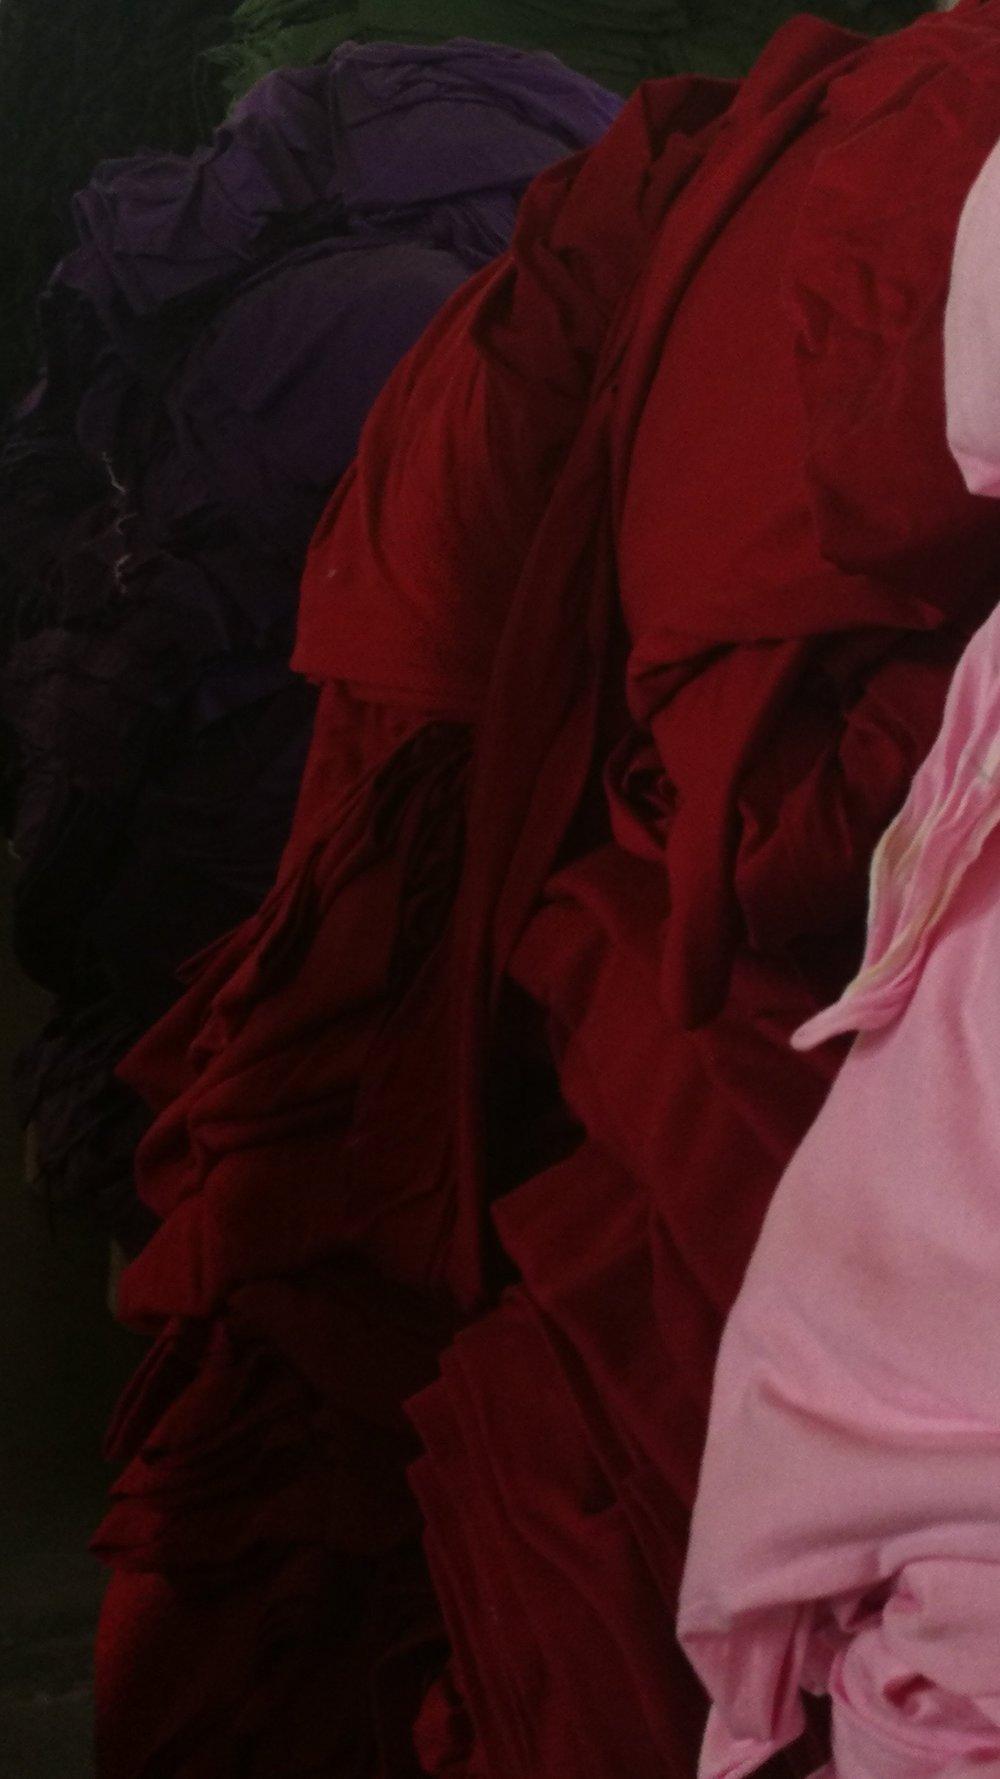 Ökologisch gefärbte Stoffe |  Eco-friendly dyed fabrics